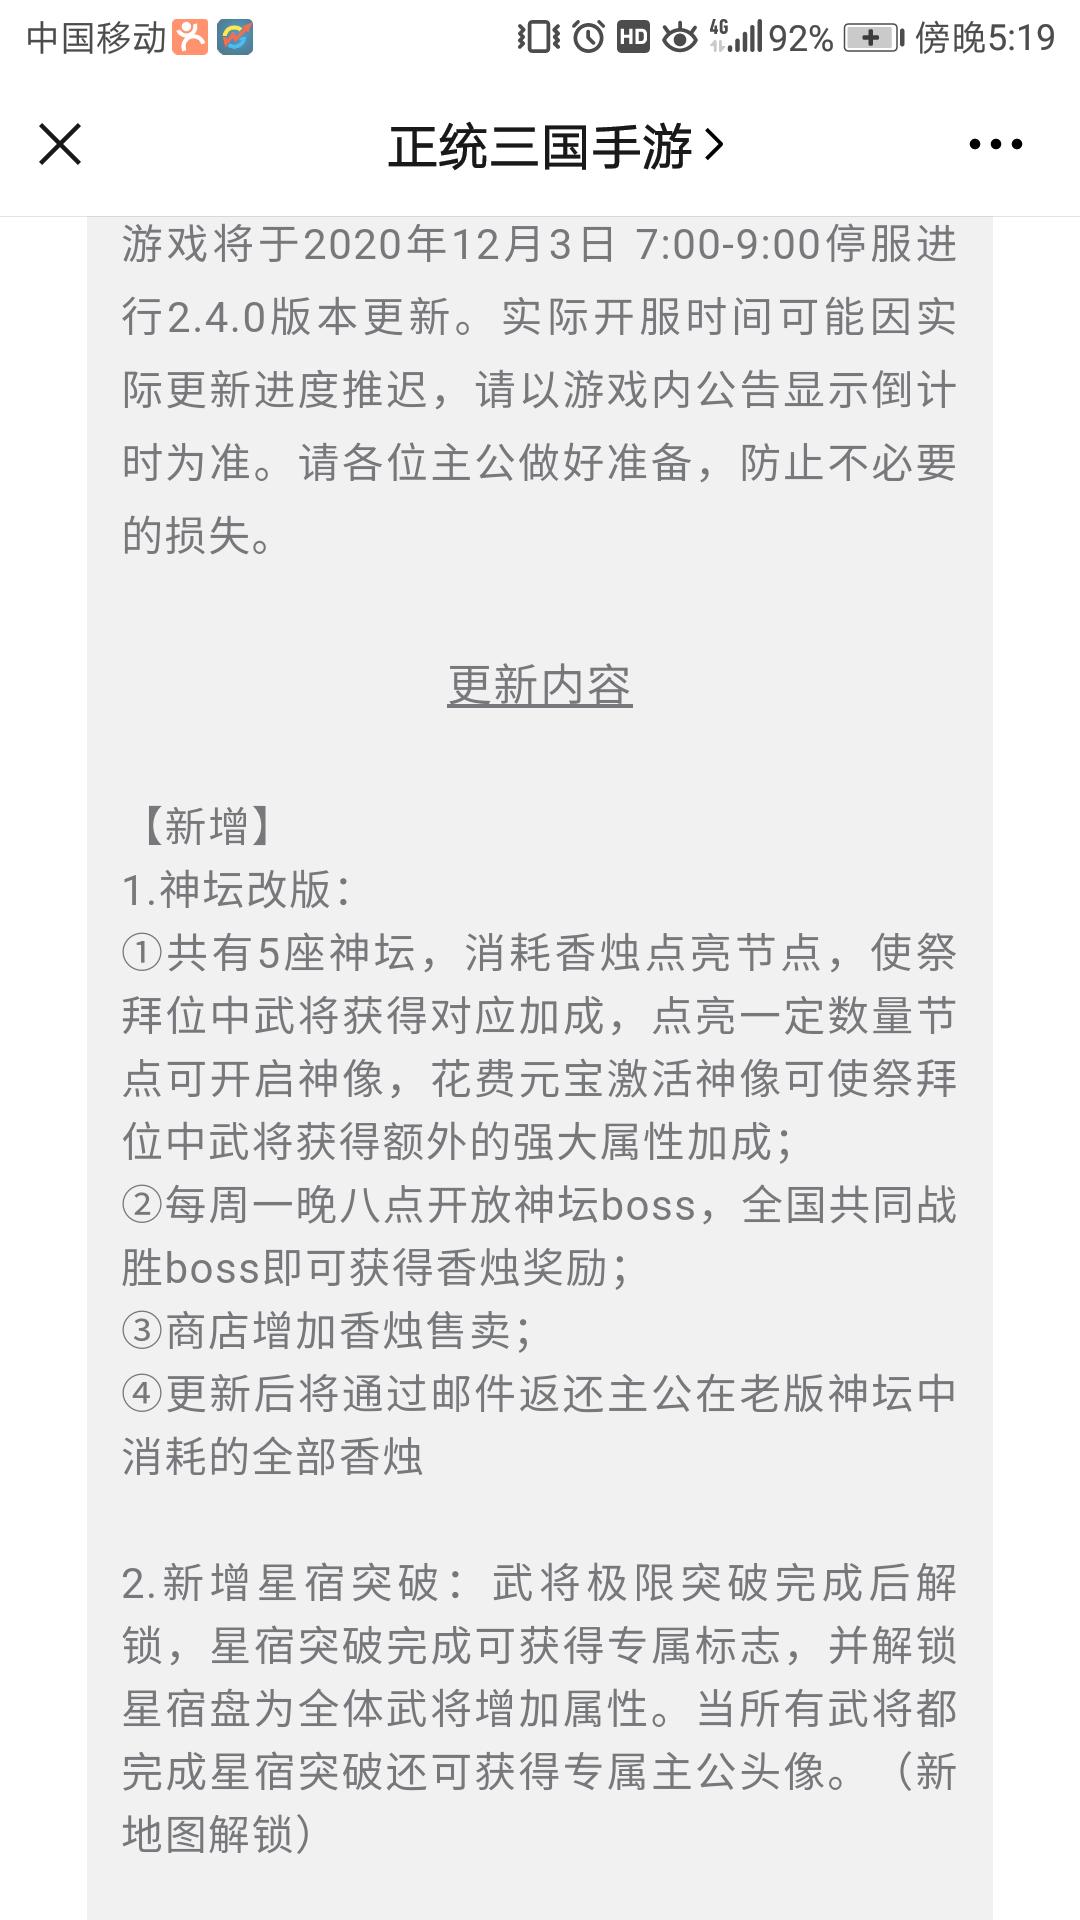 Screenshot_20201202-171947.png